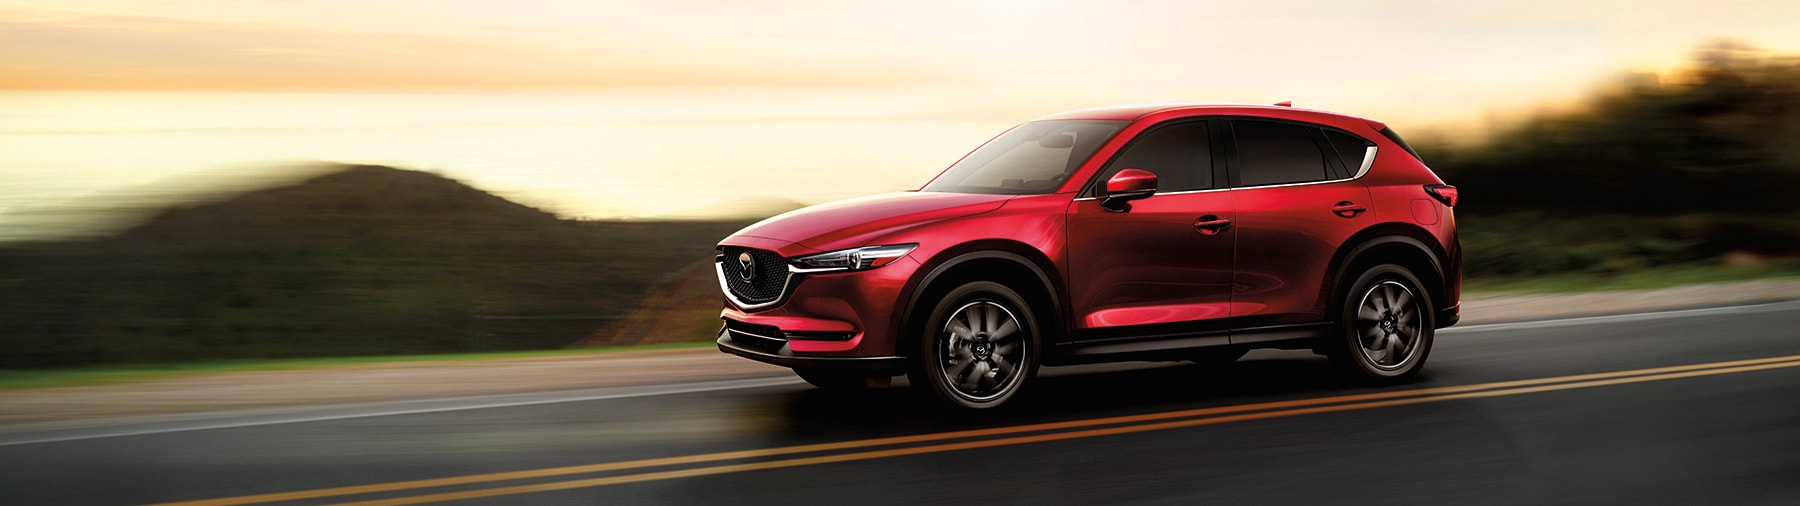 Hyman Bros Mazda New Mazda Dealership In Newport News VA - Mazda dealership virginia